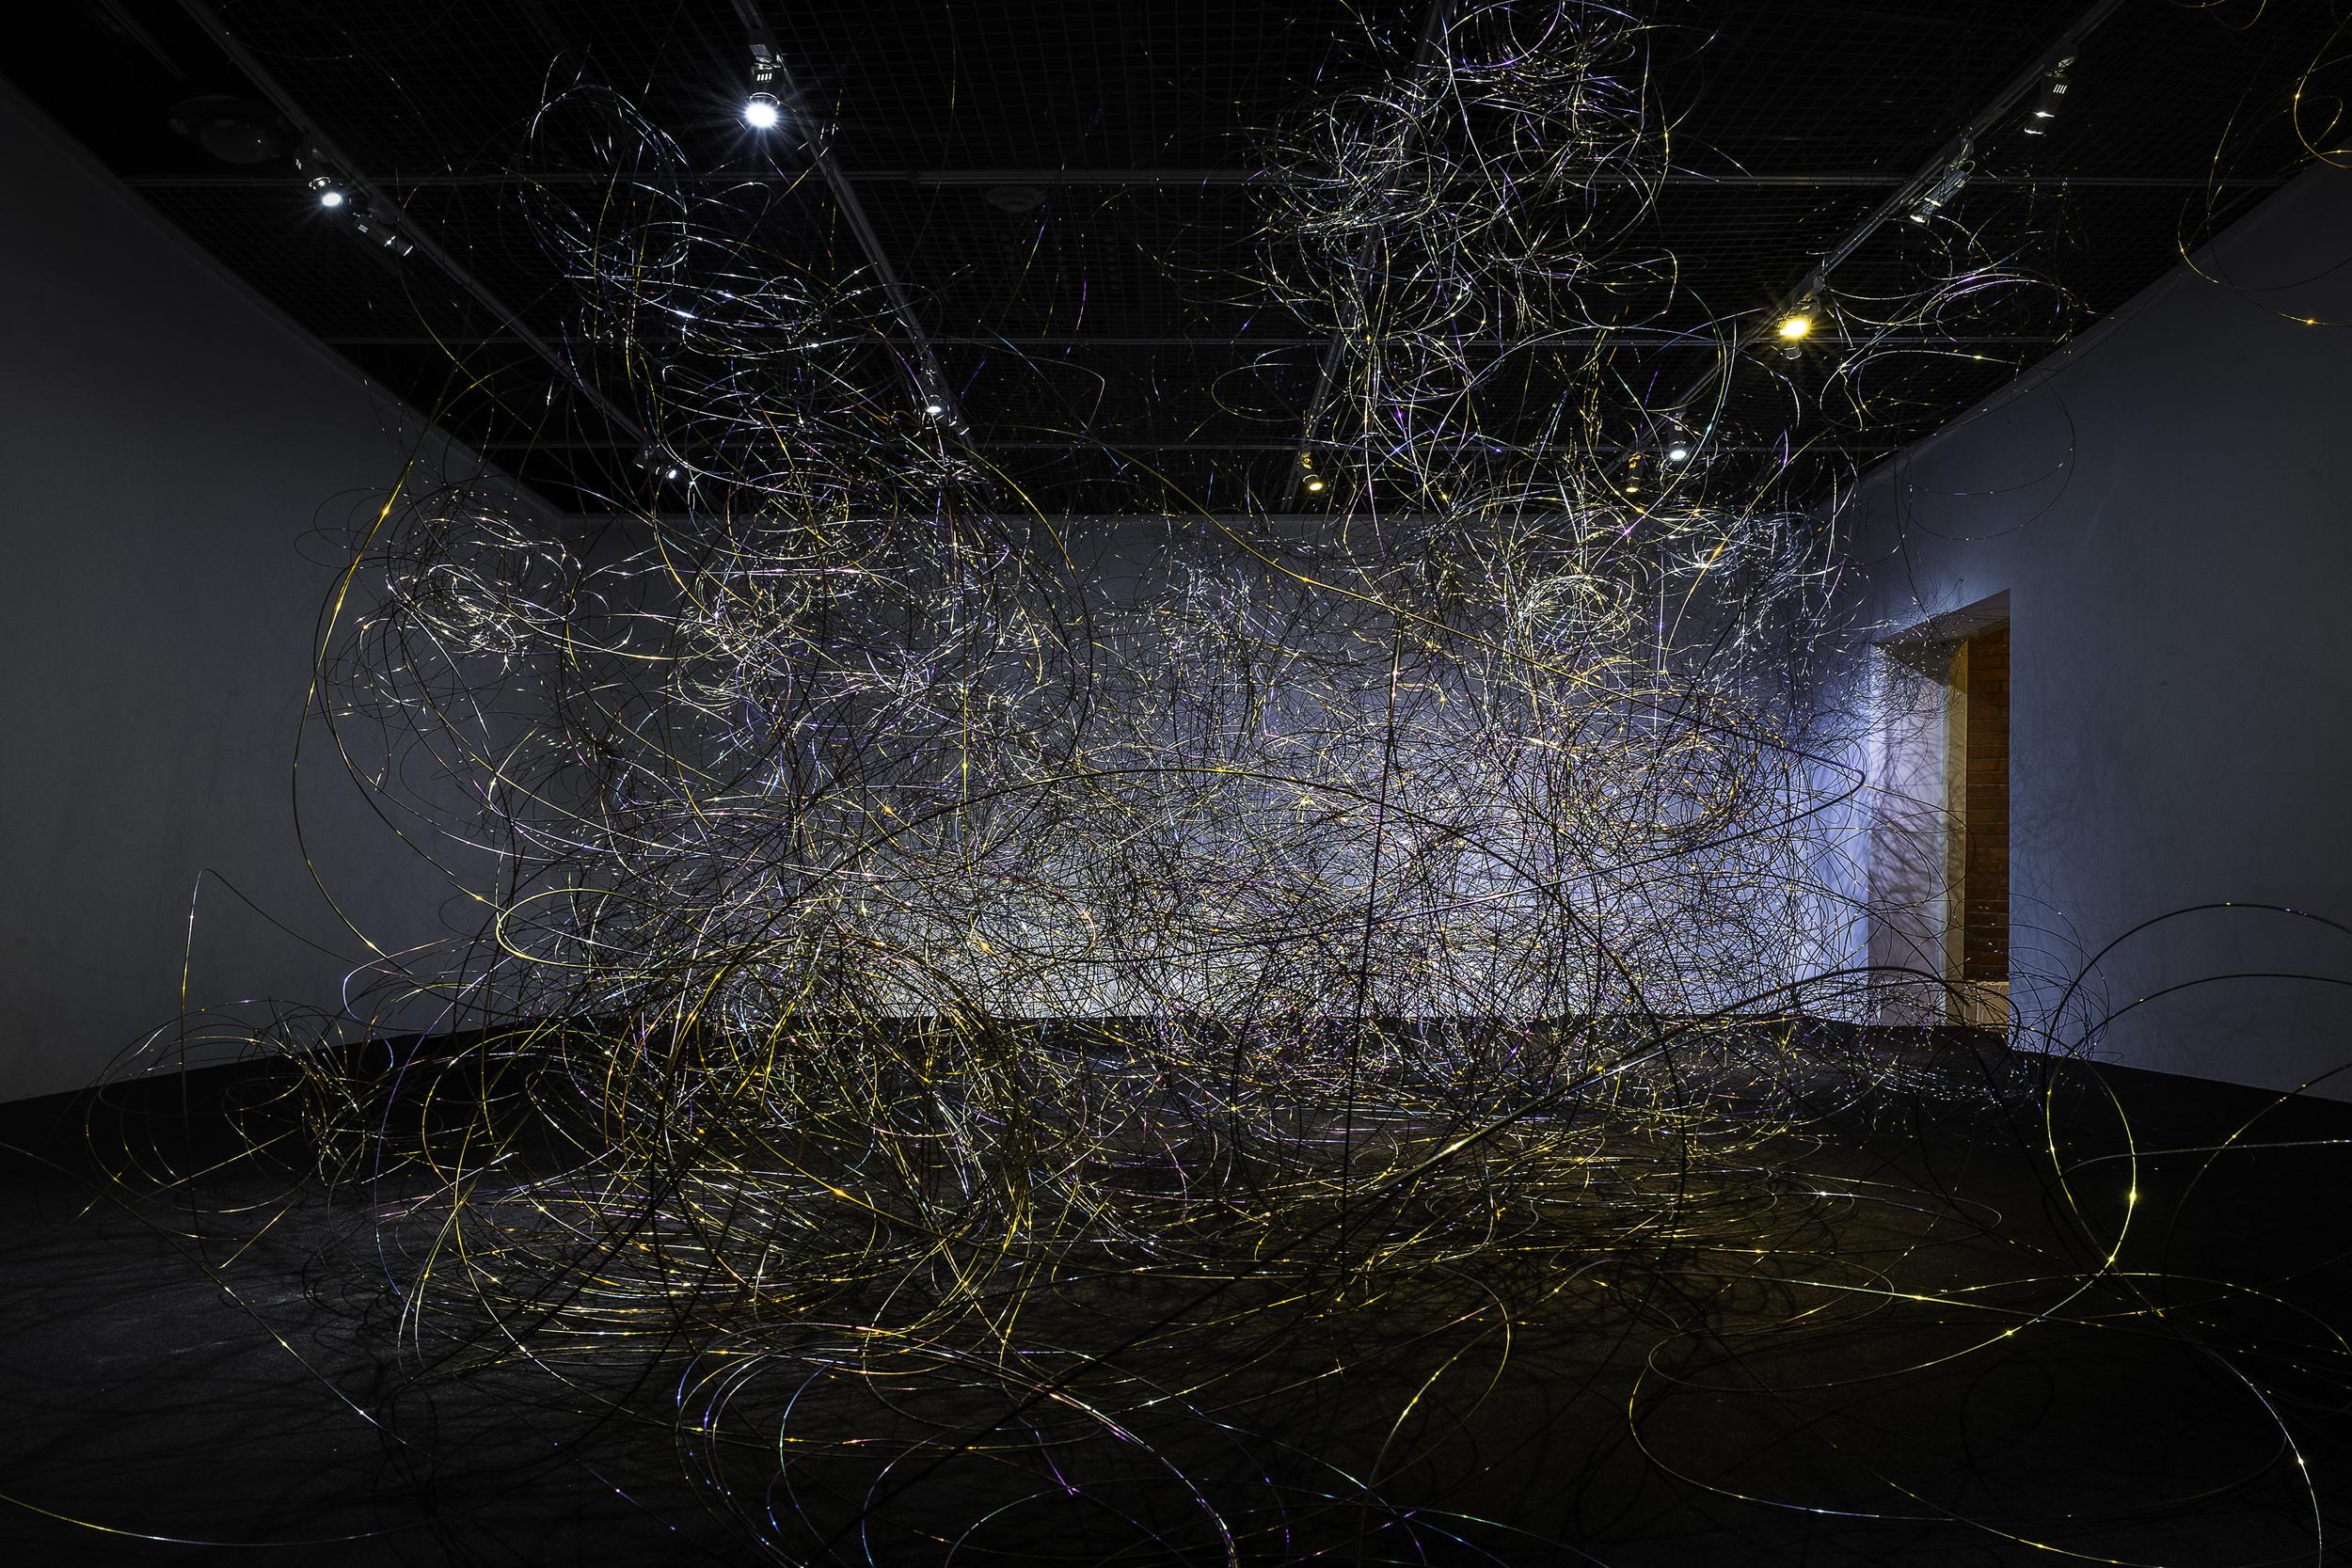 Zheng Lu 郑路, Three Thousand Meters Annoyance Silk 三千米烦恼丝, 2015, Stainless steel and electroplate 不锈钢、电镀, Dimensions variable 尺寸可变